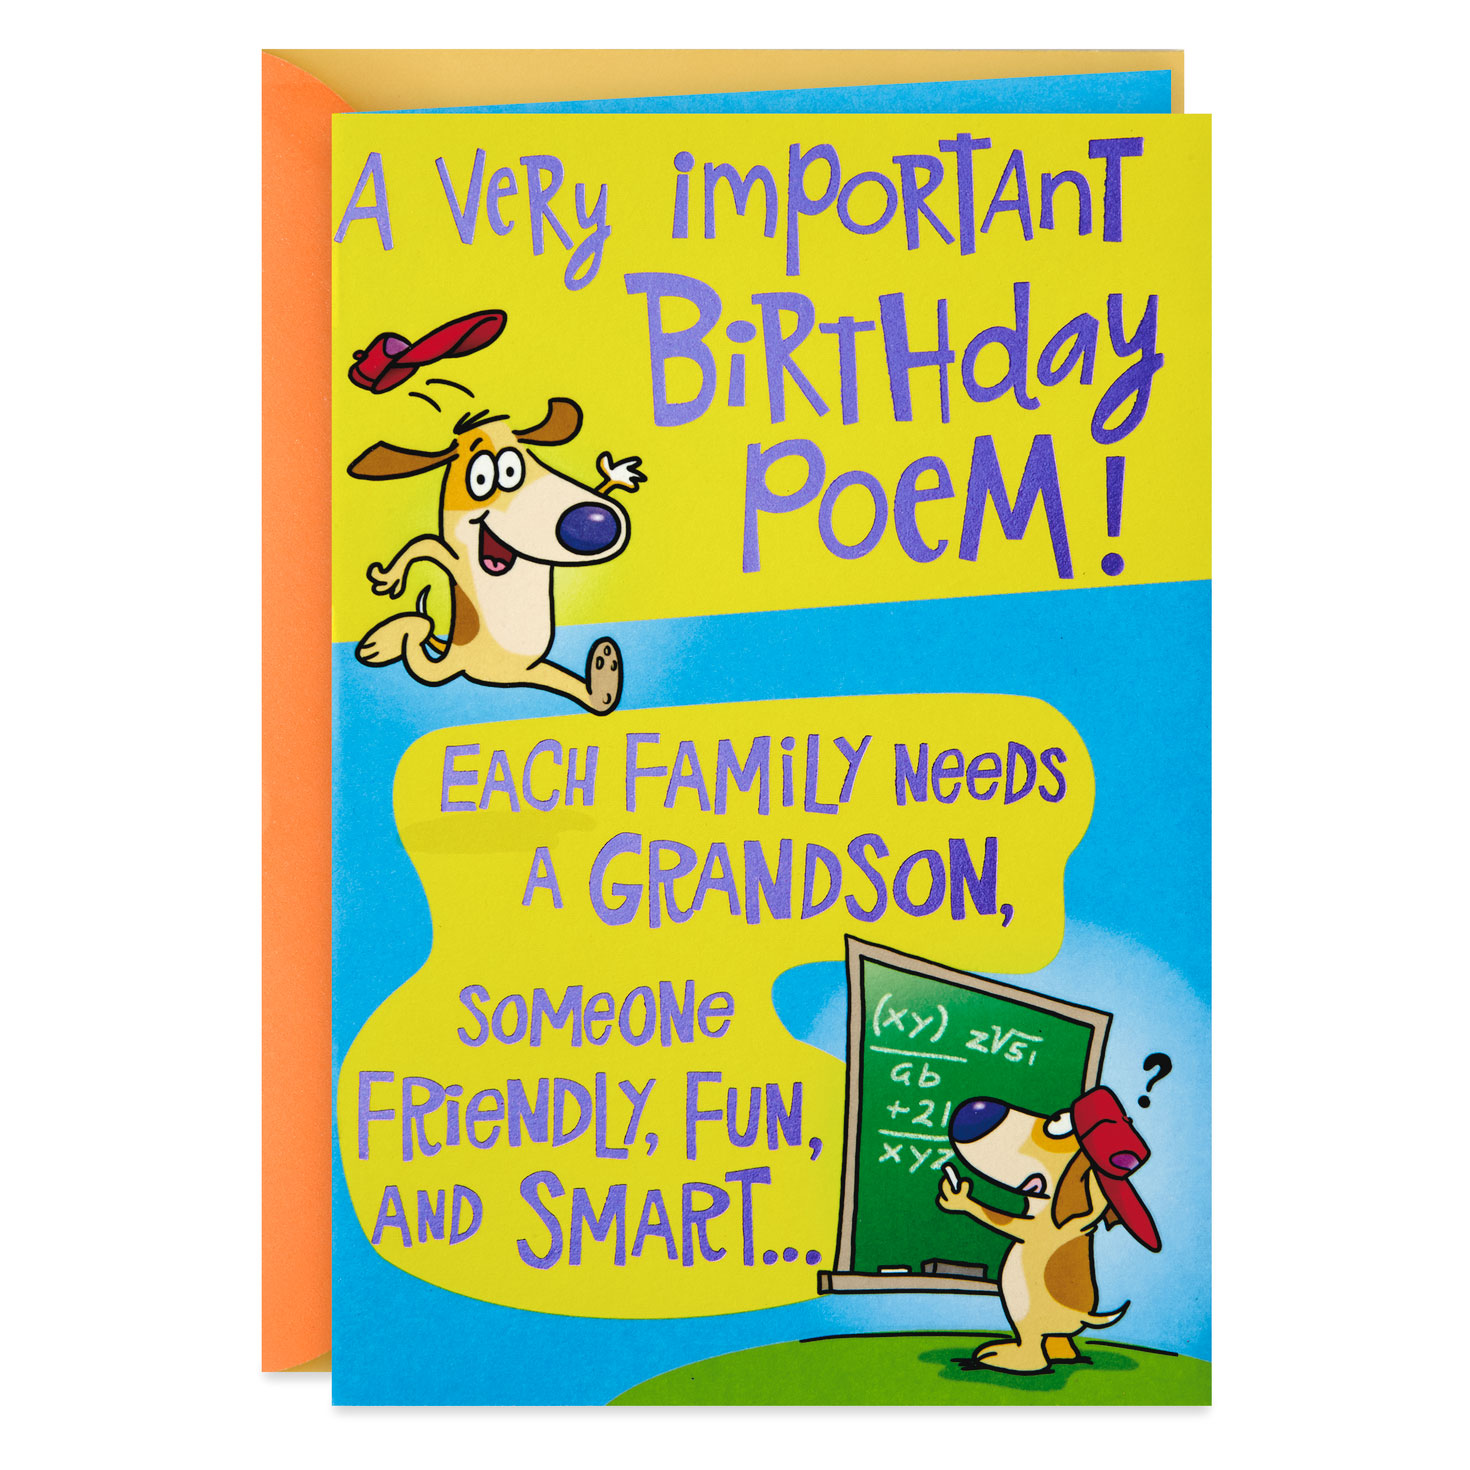 poem for a fun grandson birthday card  greeting cards